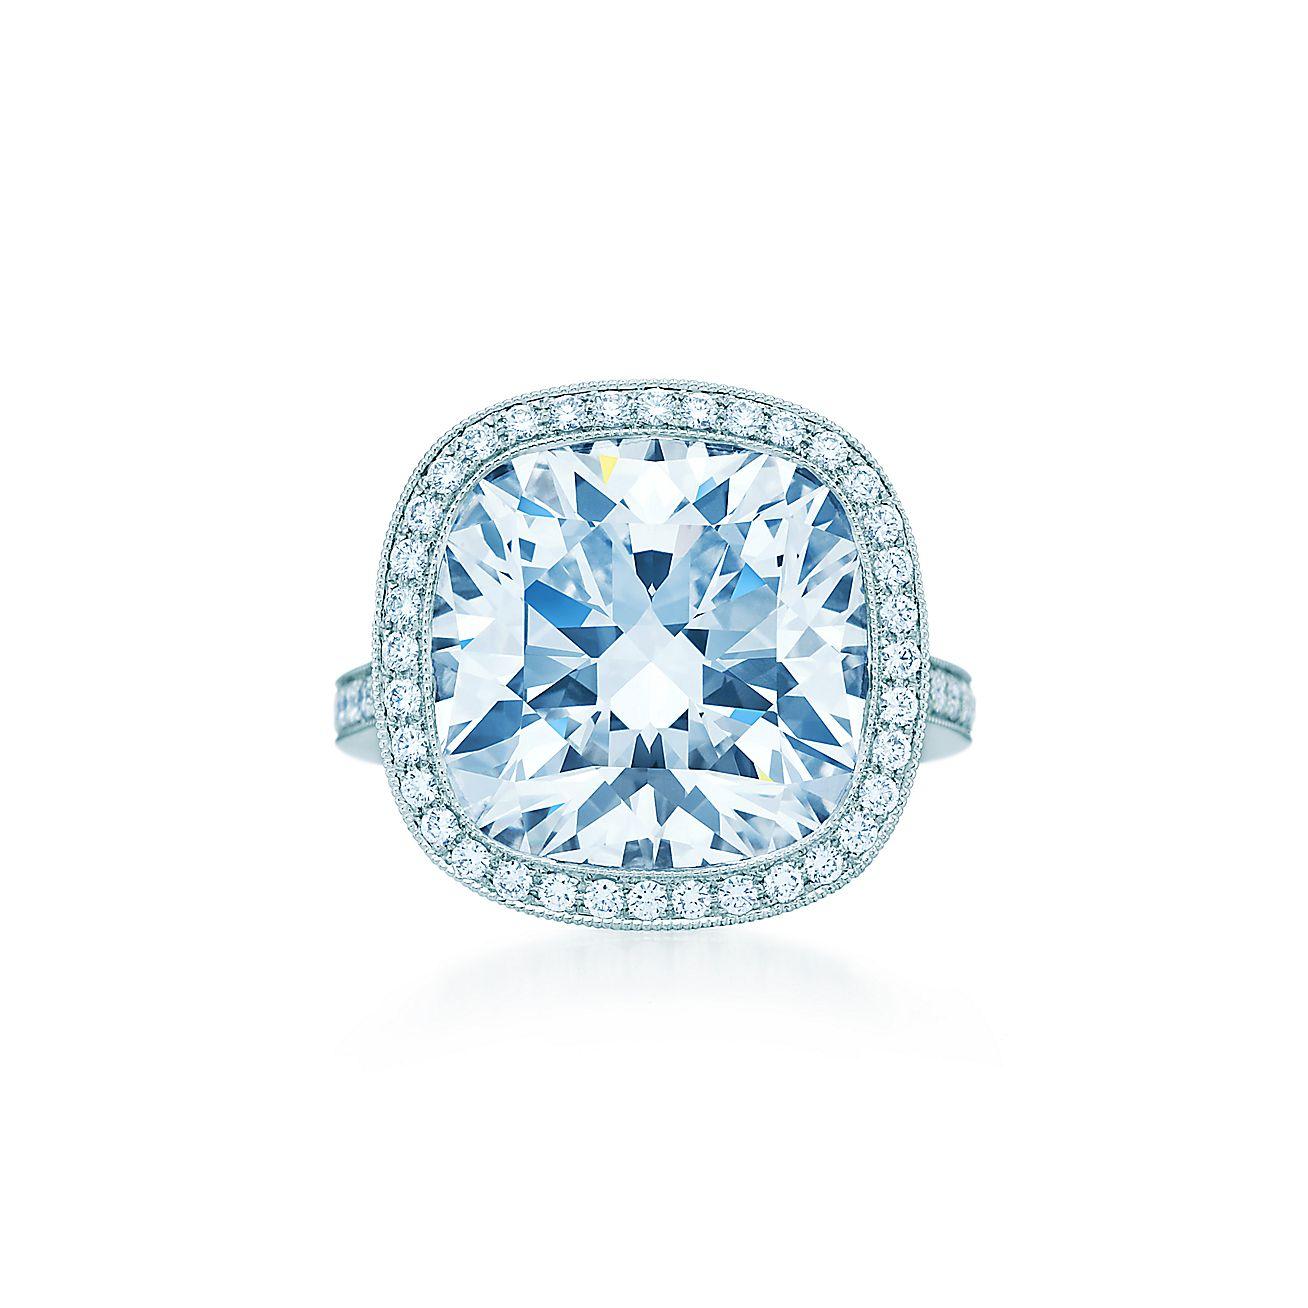 Cushion Cut Diamond Ring In Platinum With Round Brilliant Diamonds